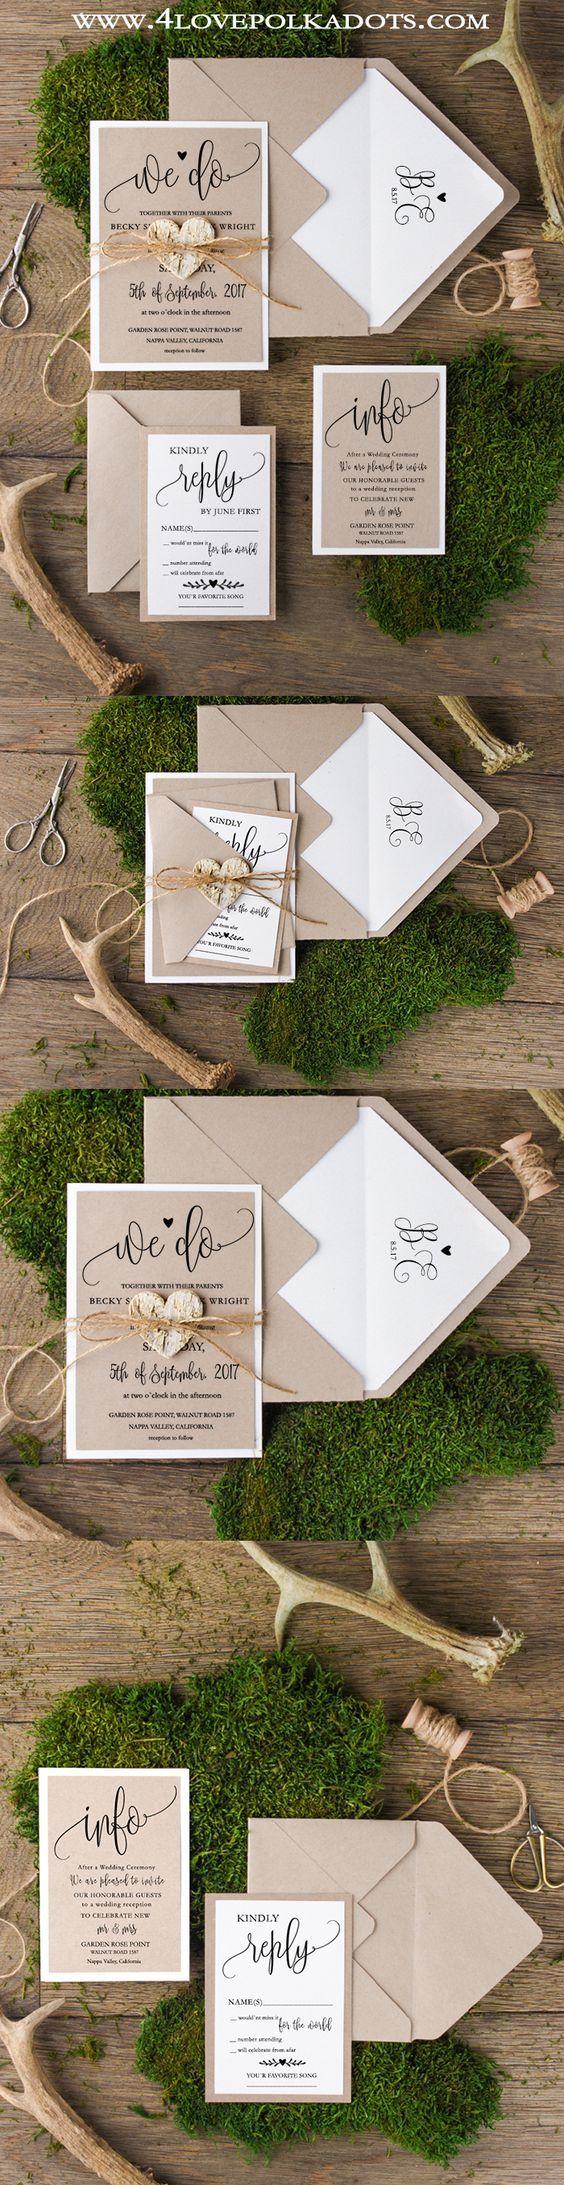 Rustic Wedding Invitations || @4lovepolkadots | O N S T R O U E ...